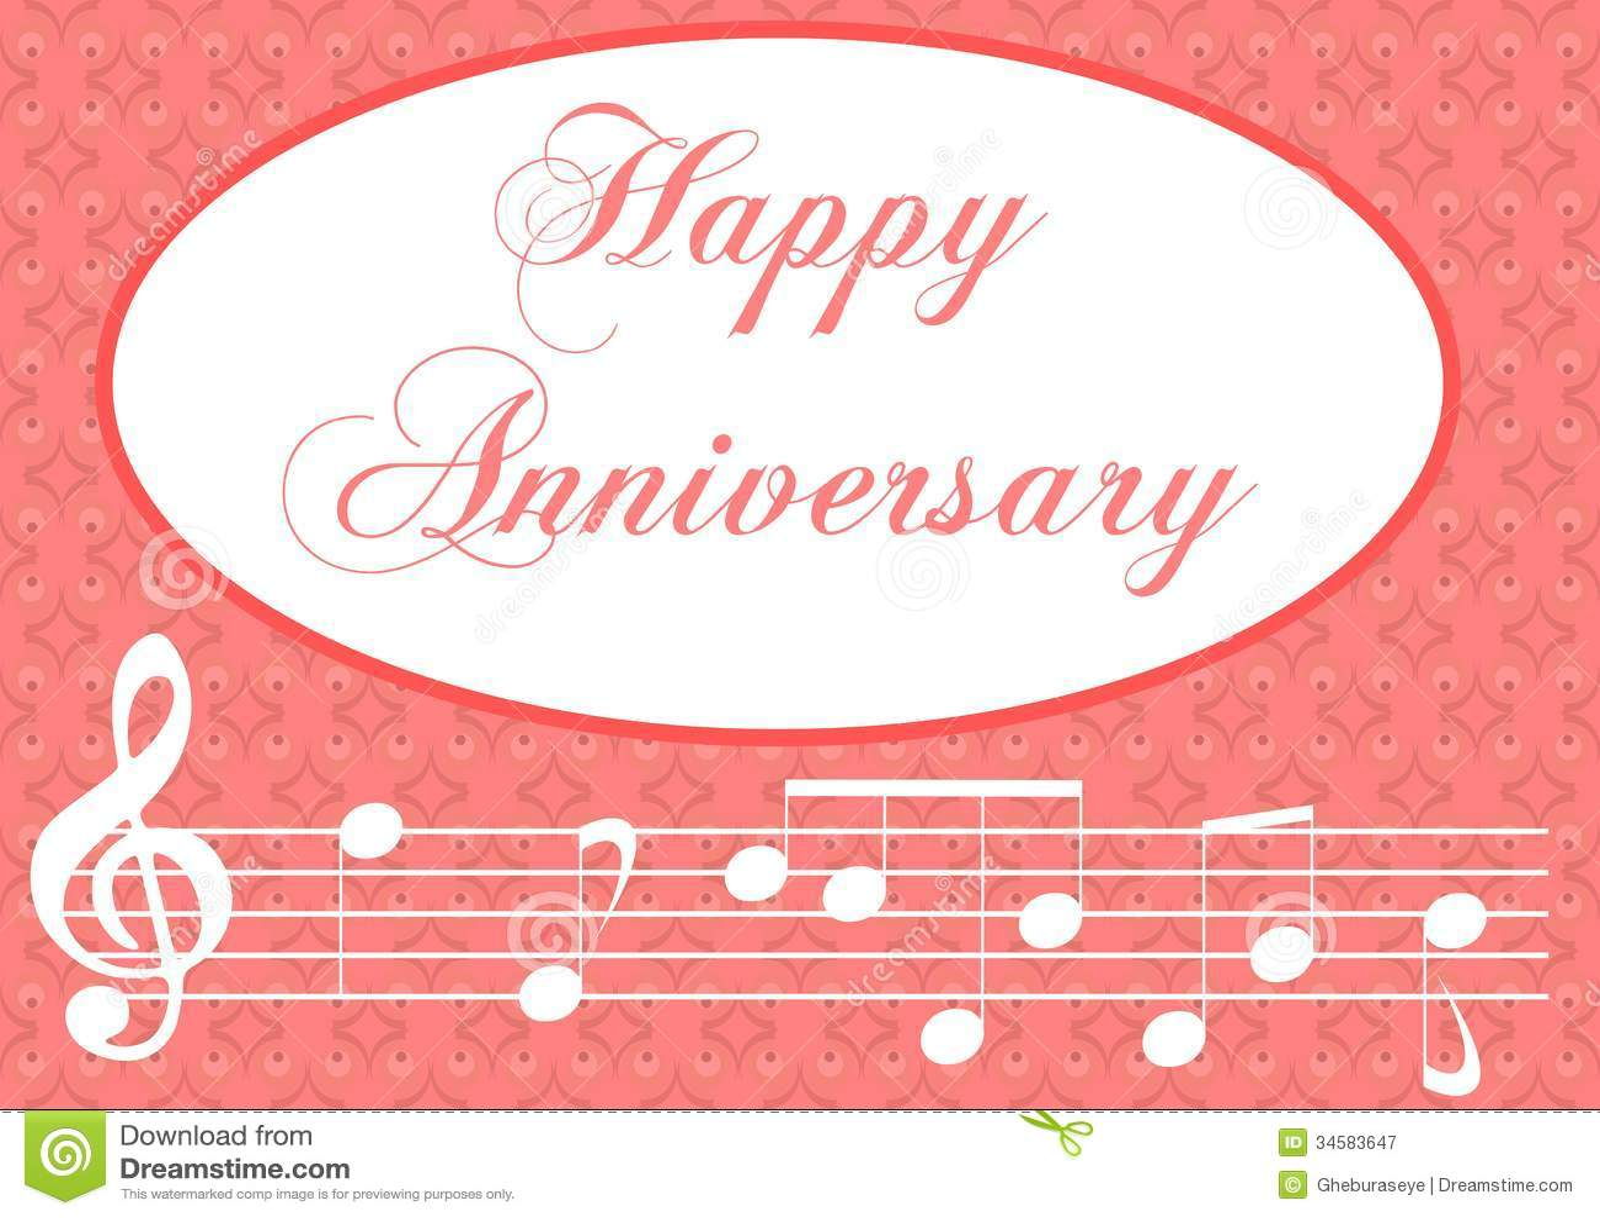 happy anniversary stock image  illustration of card